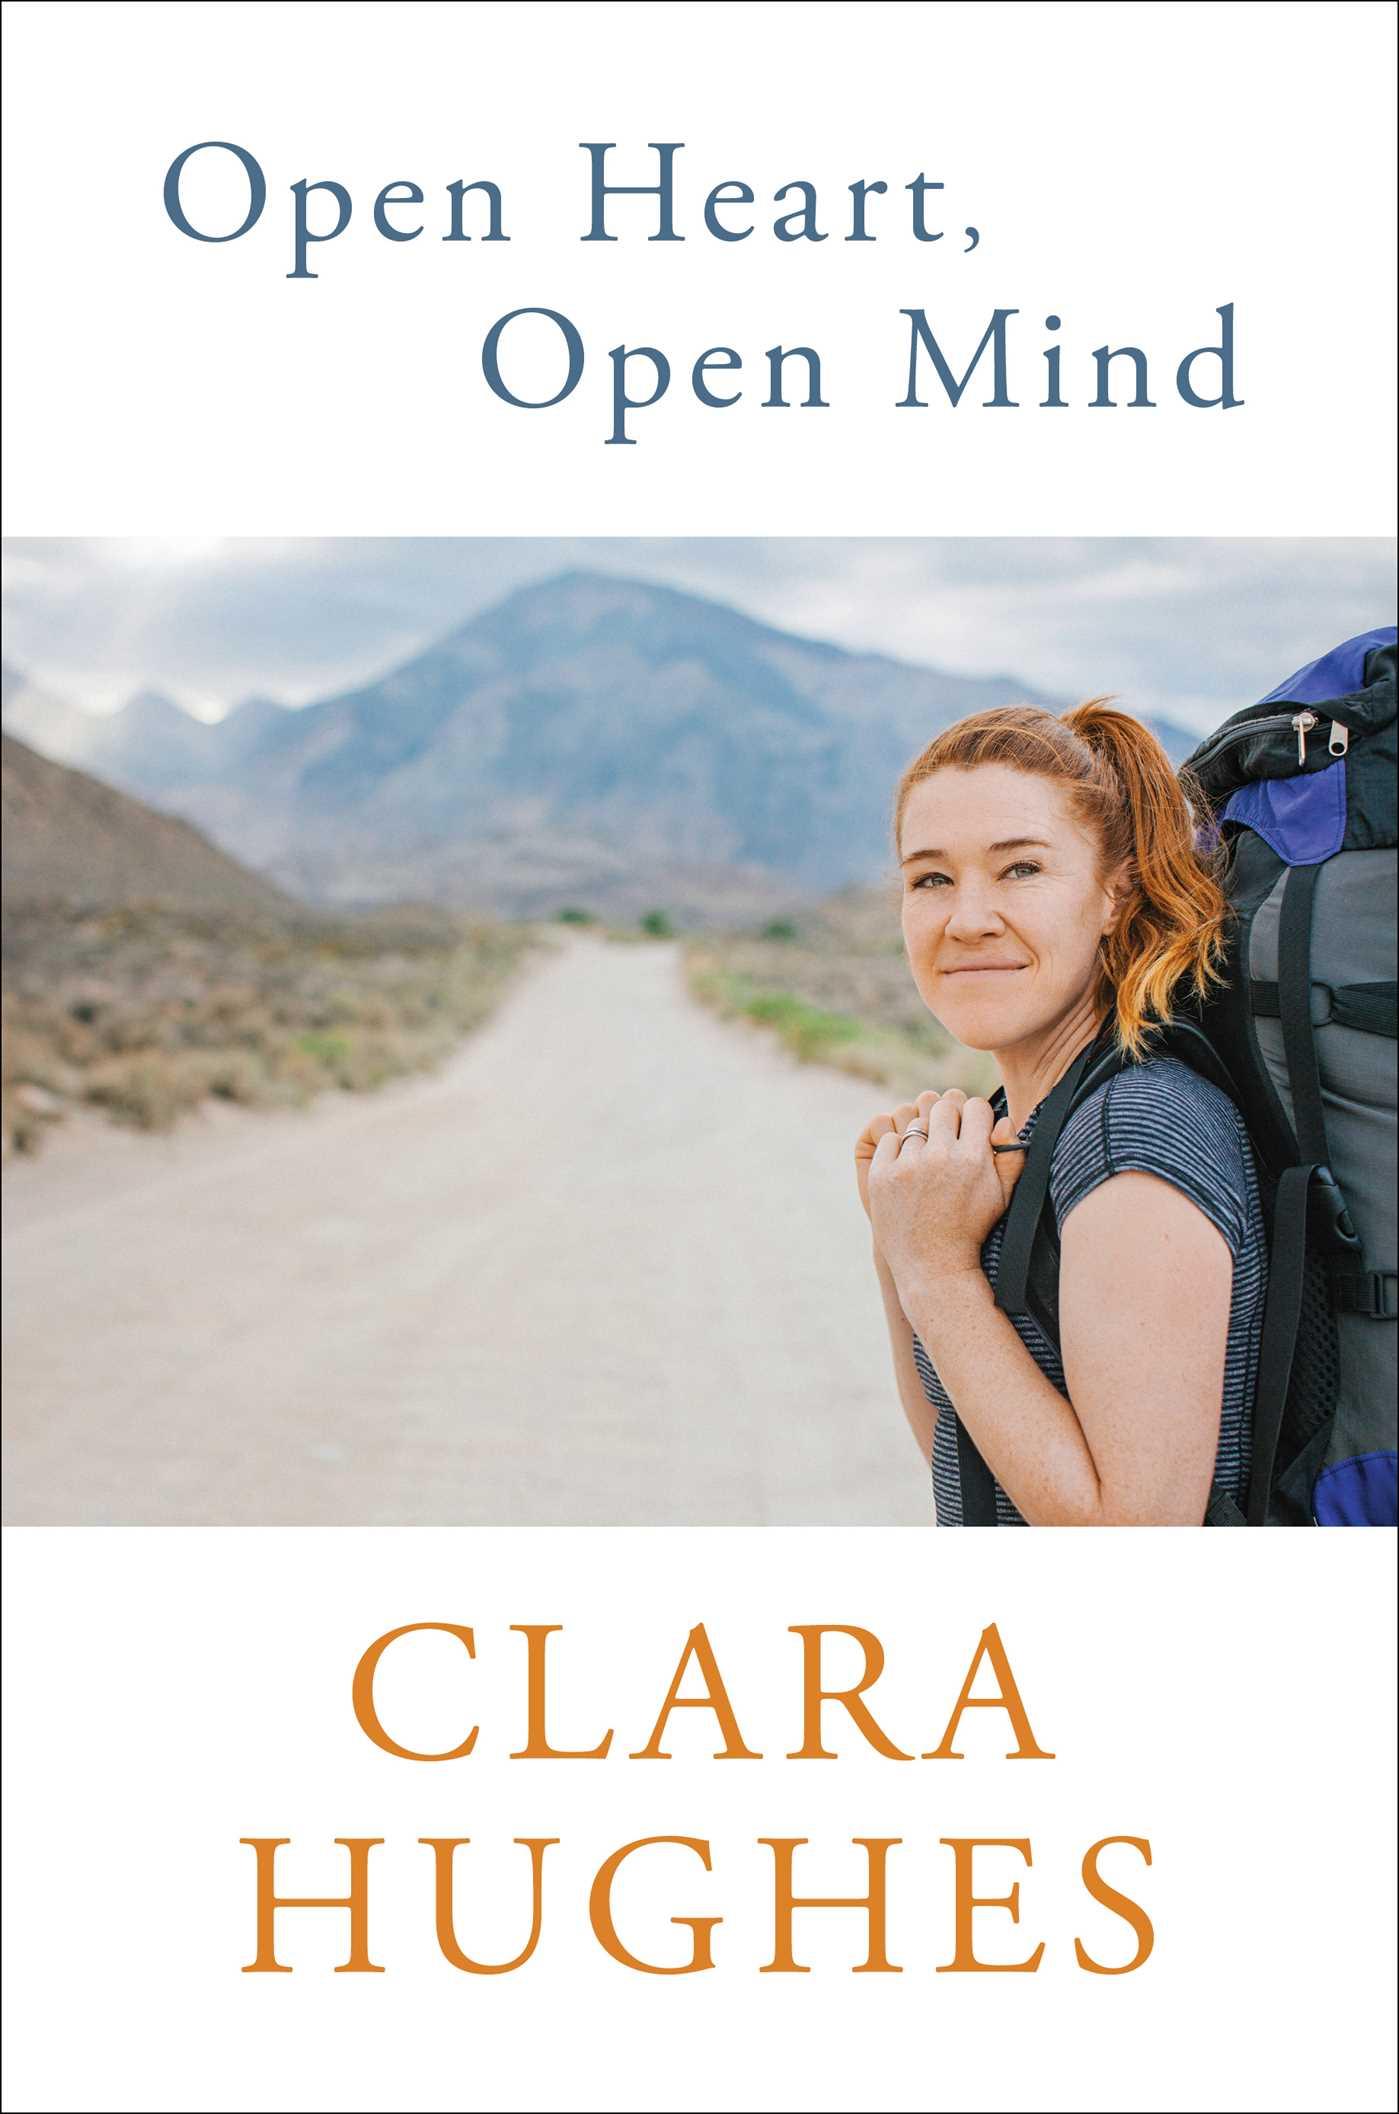 Open heart open mind 9781476756981 hr